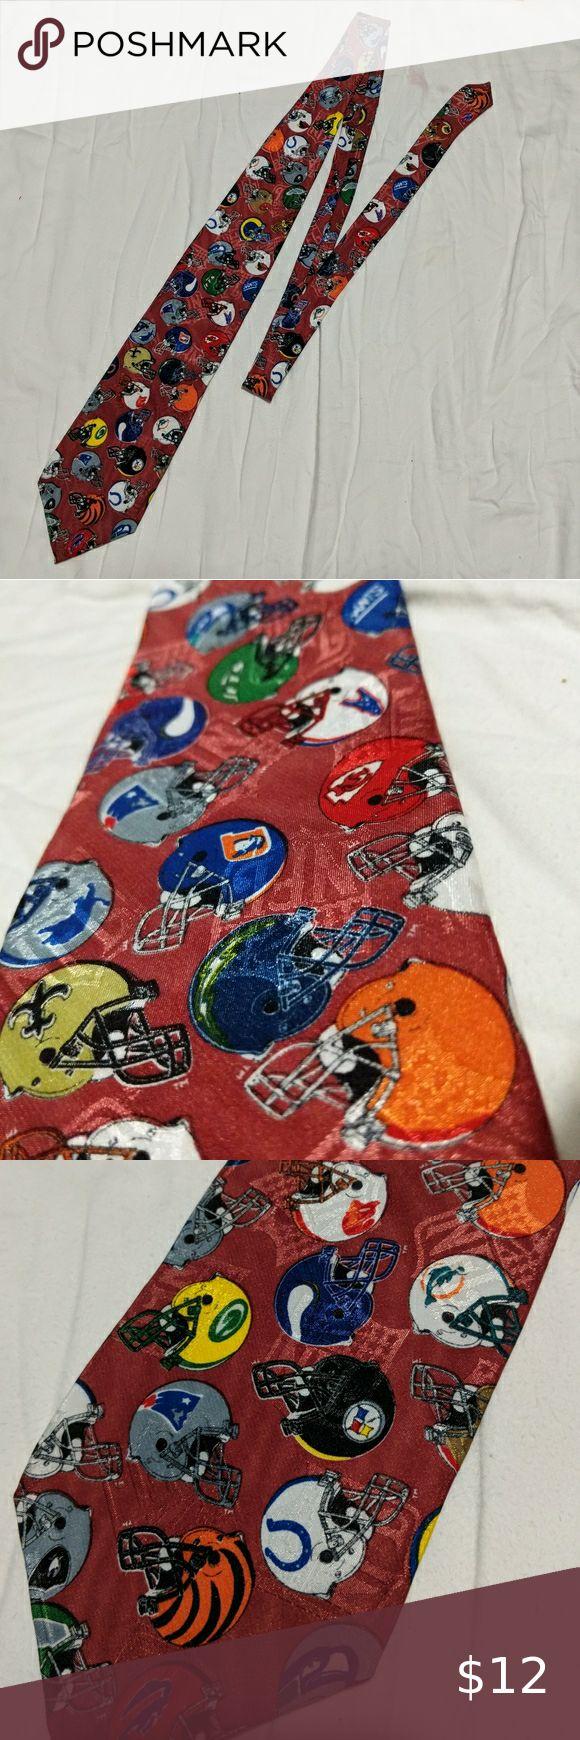 NFL Team Novelty Football Helmets Neck Tie in 2020